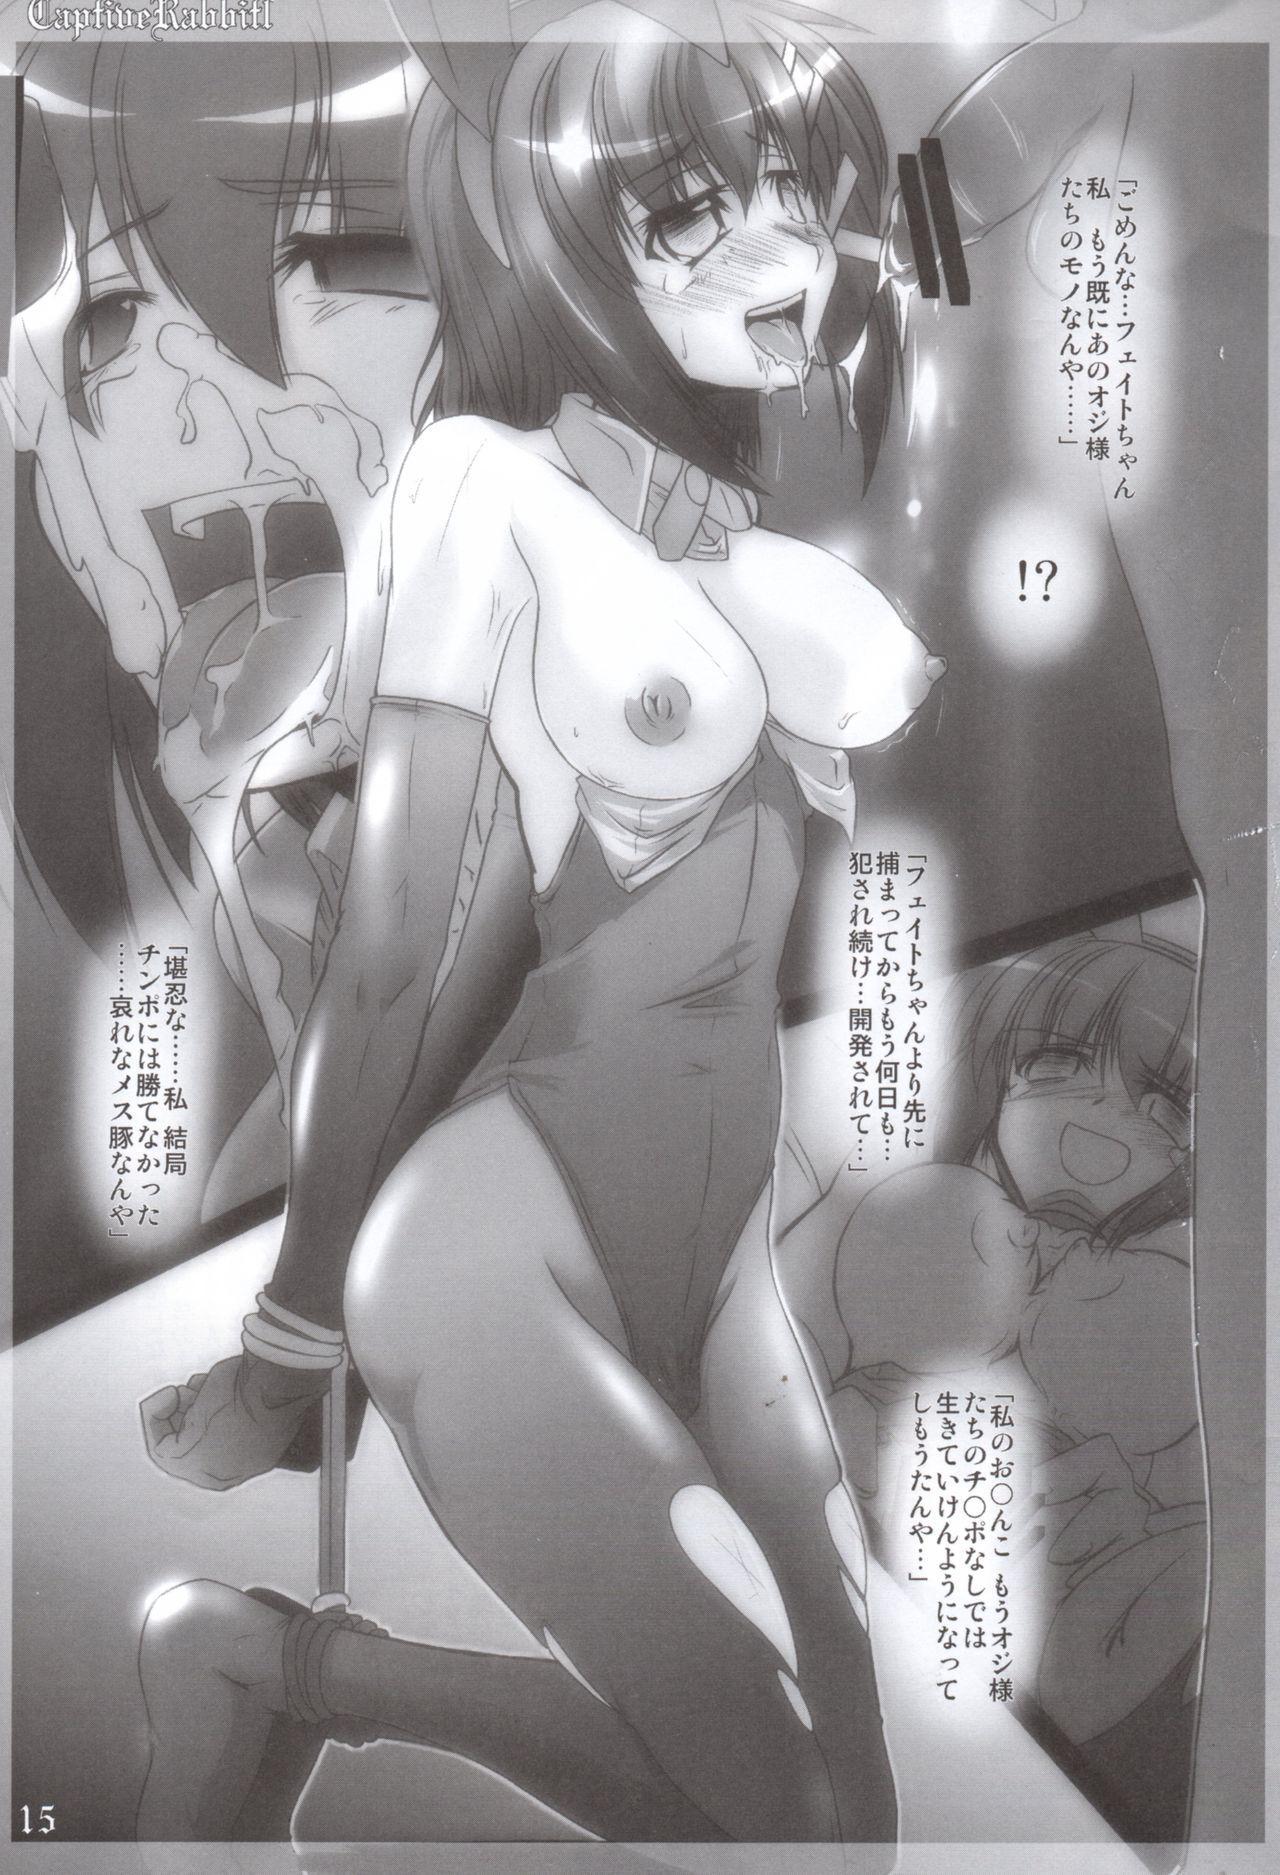 Captive Rabbitl 15